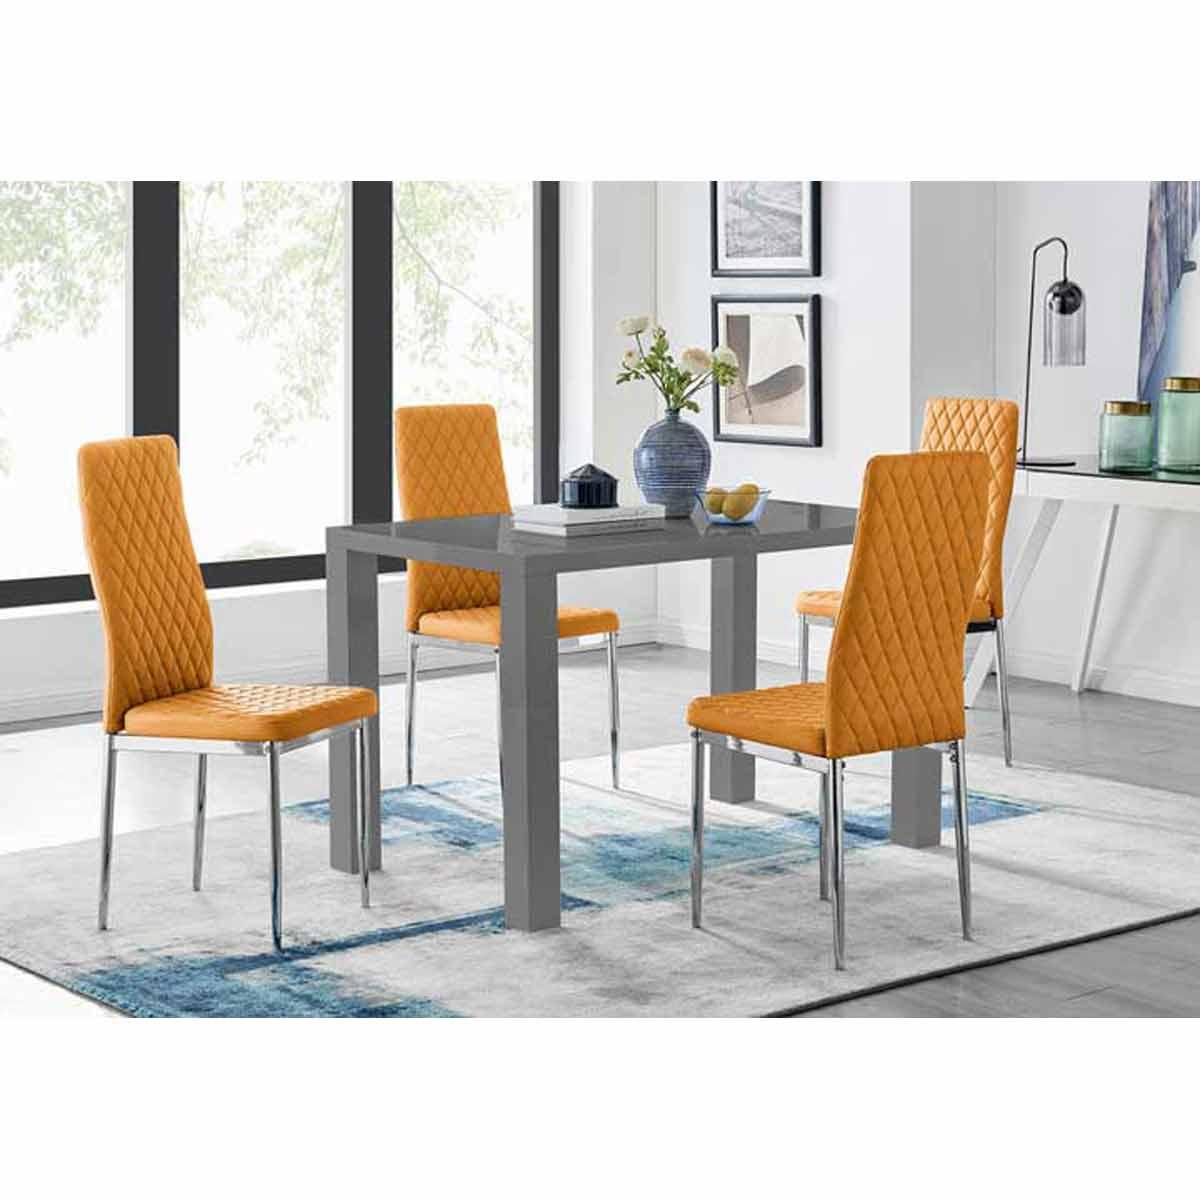 Furniture Box Pivero 4 Grey High Gloss Dining Table And 4 Modern Mustard Milan Chairs Set